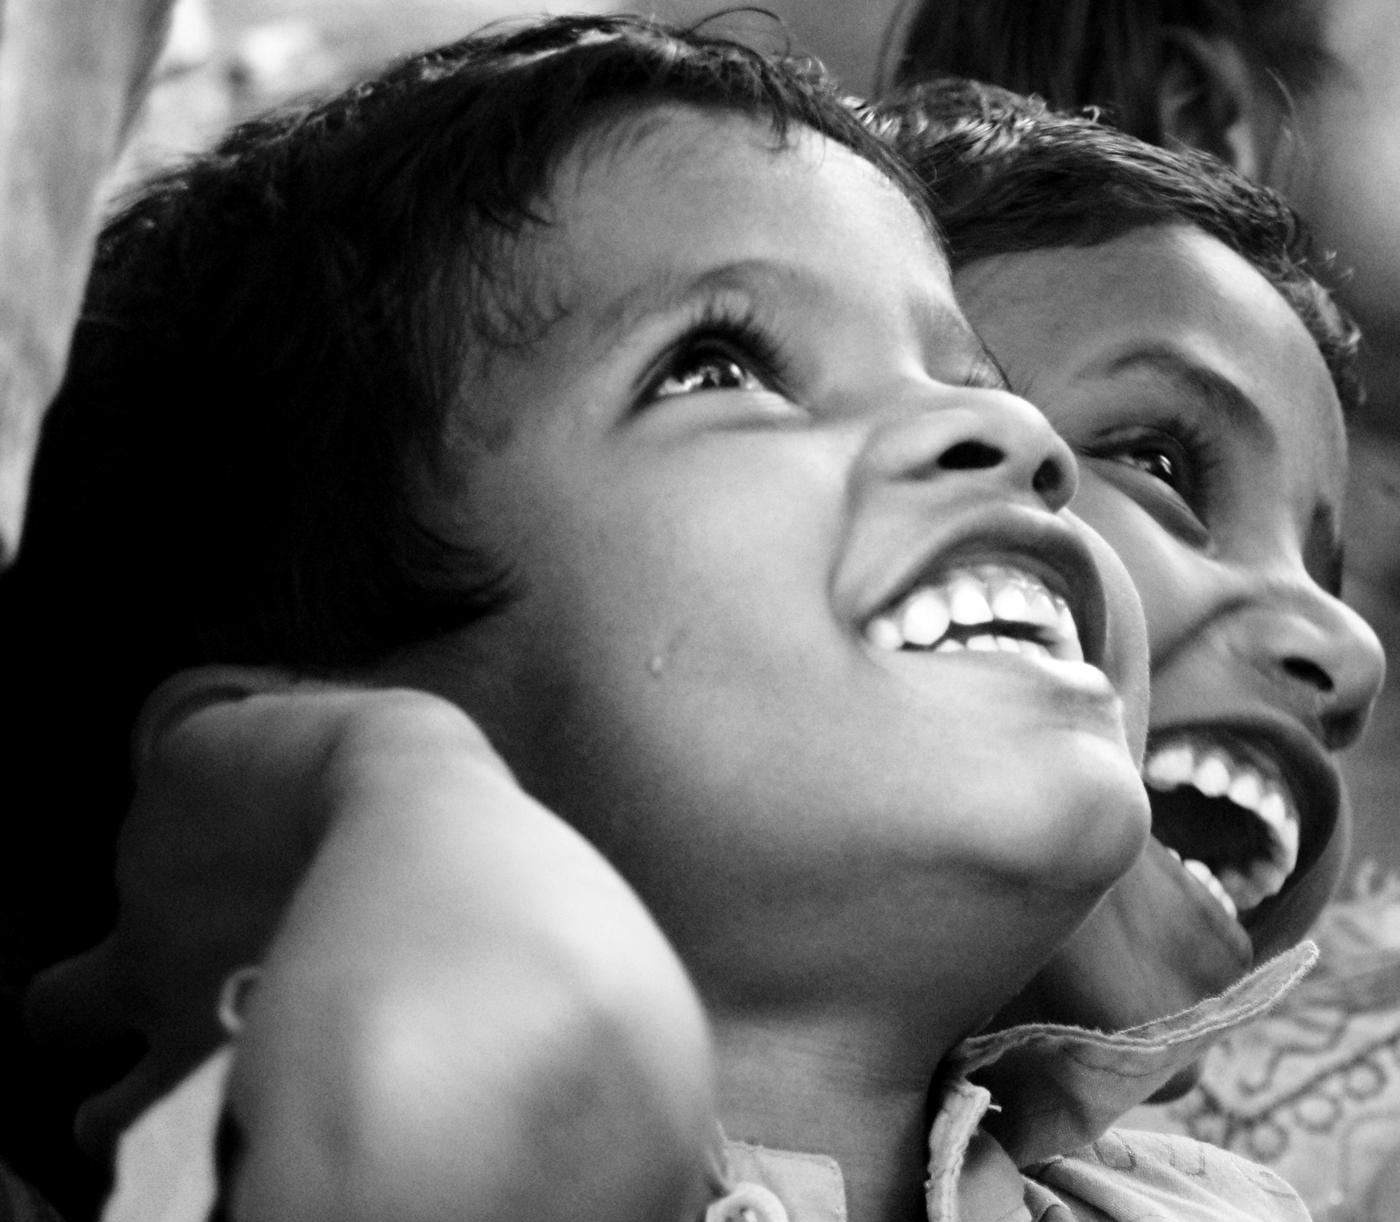 Description Smiles of innocence jpgInnosense